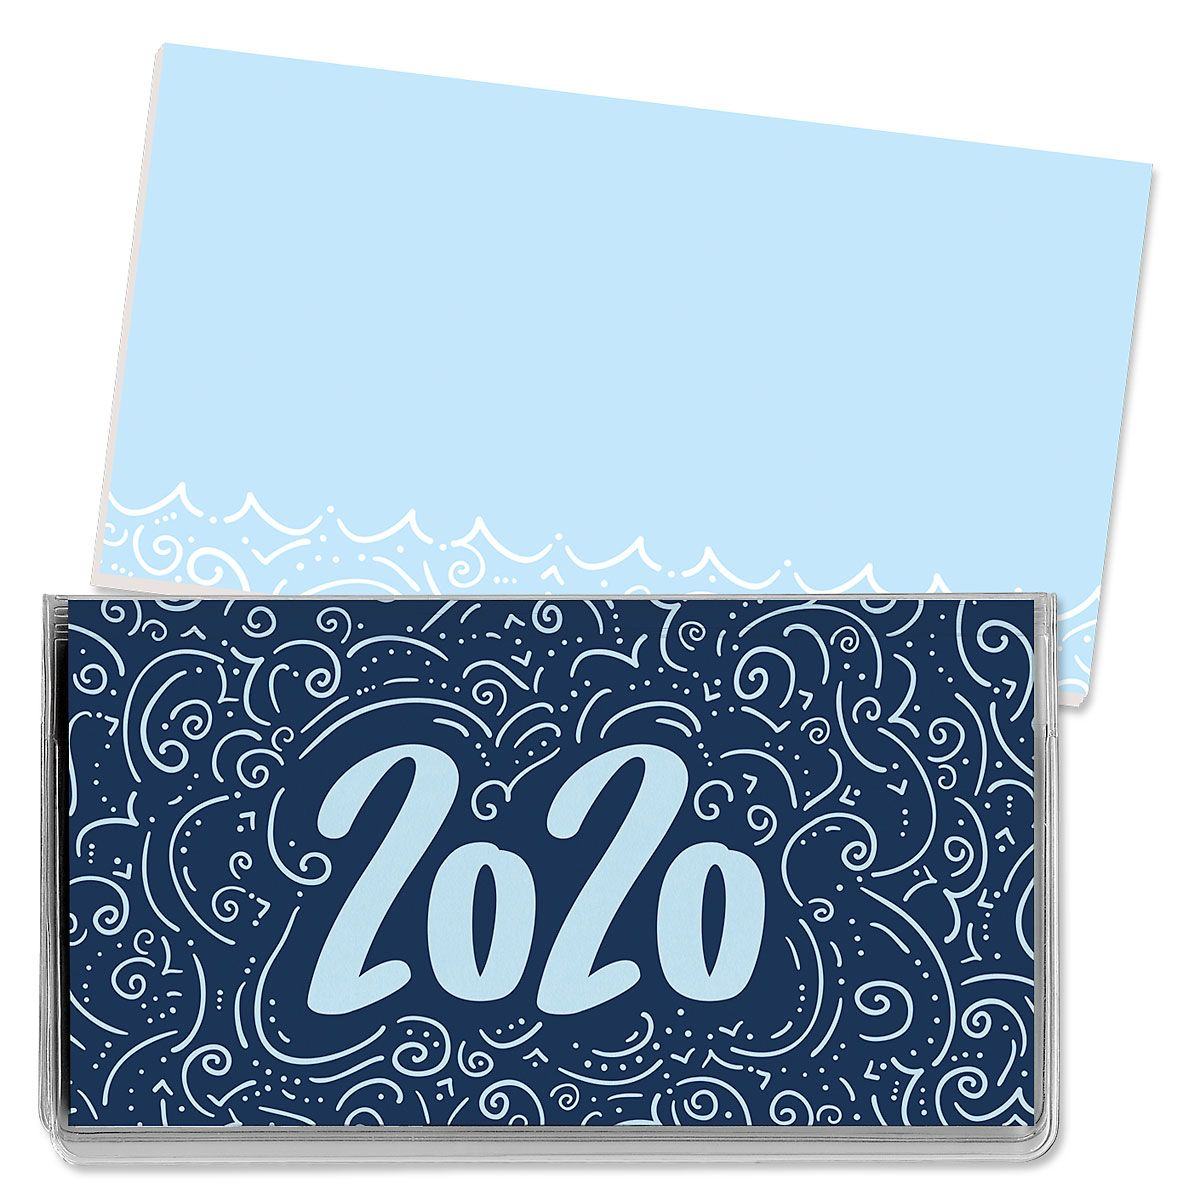 2020 Calligraphy Pocket Calendar